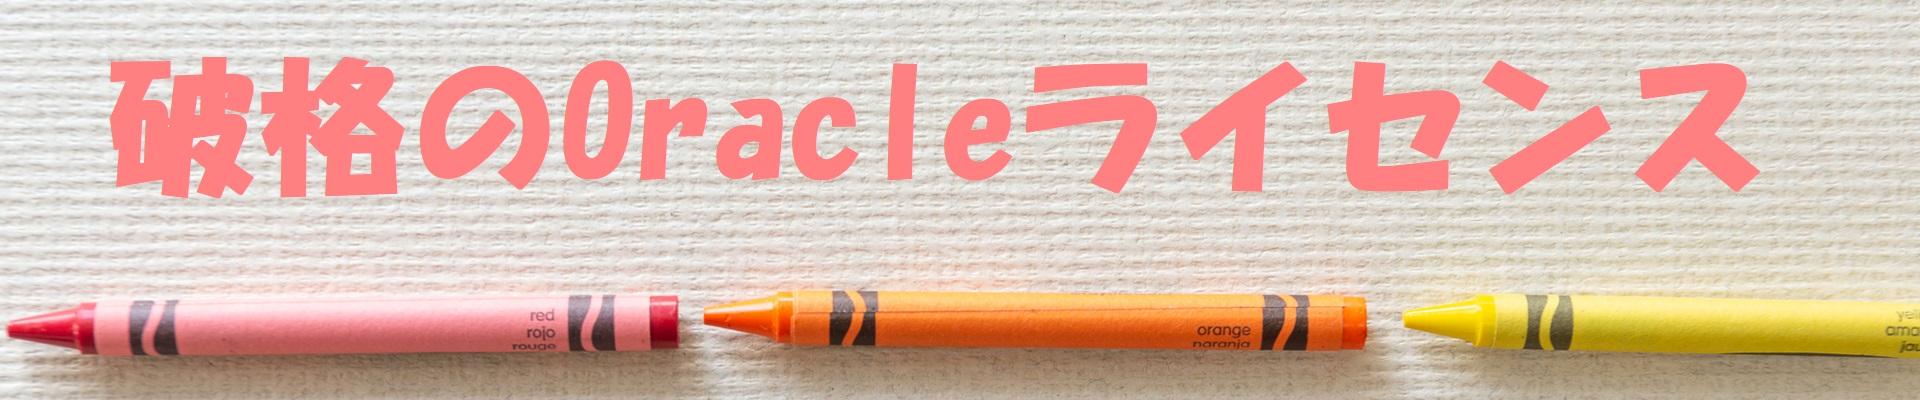 Oracleライセンス